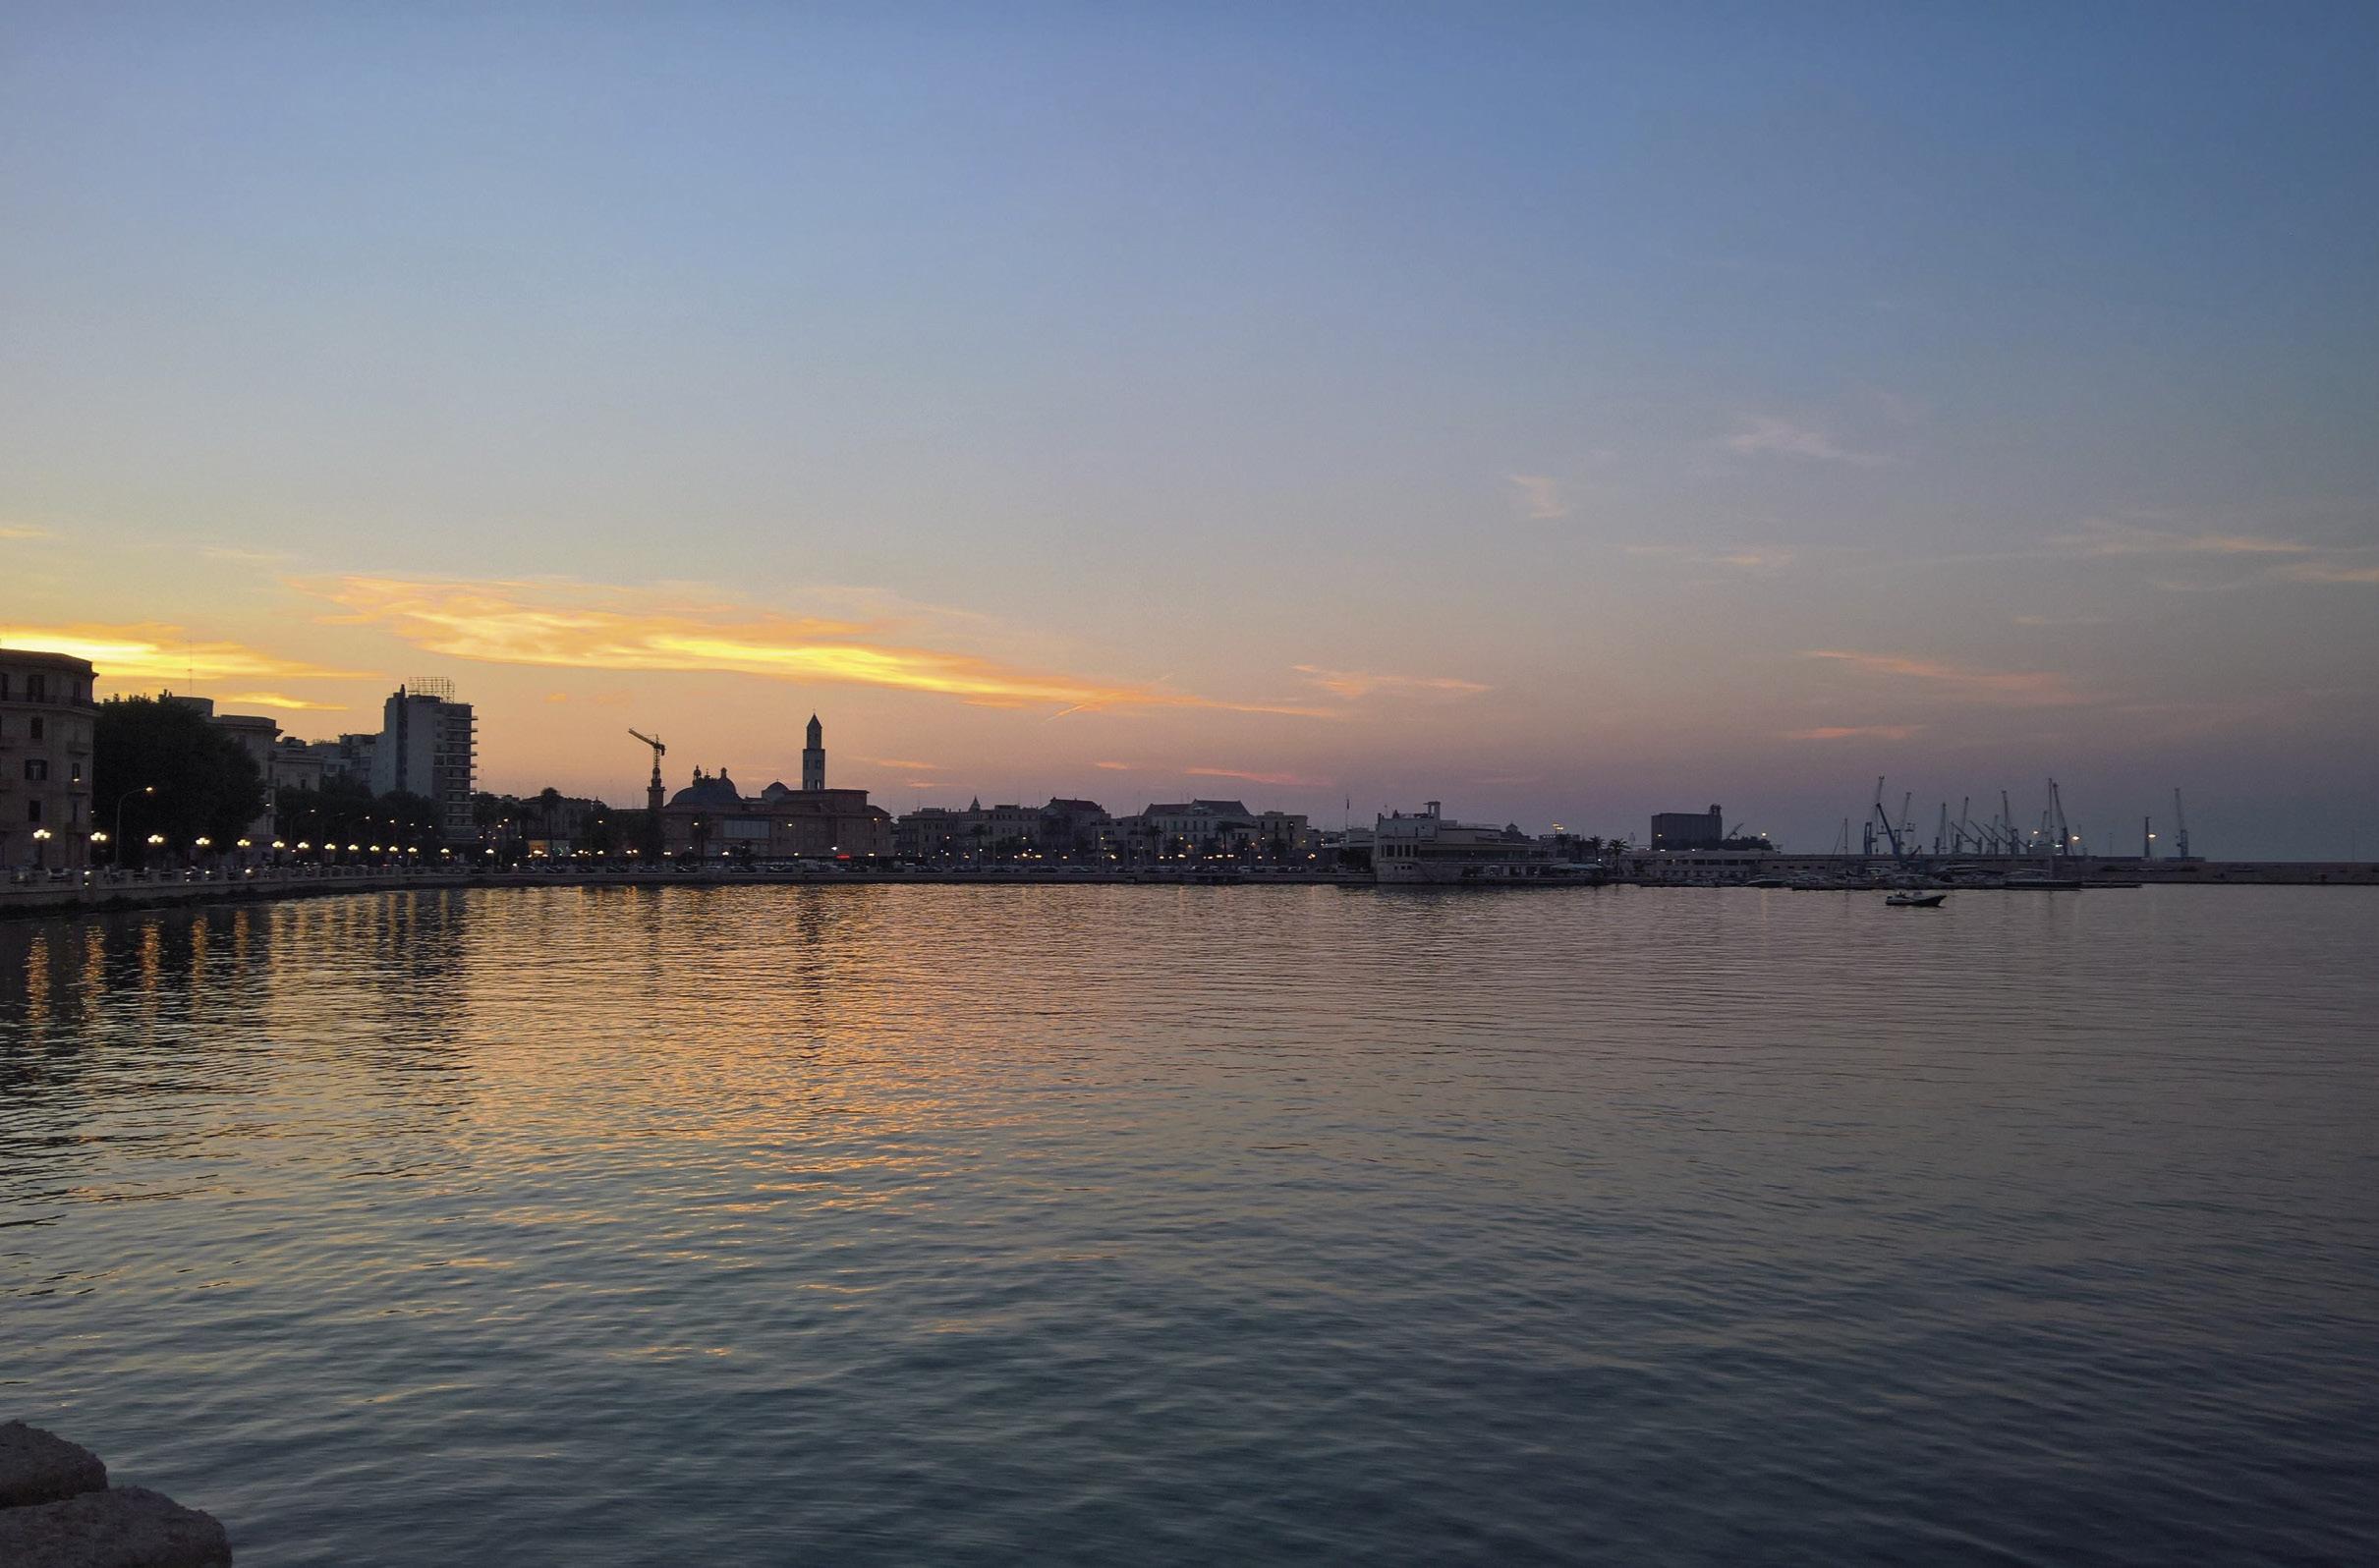 Bari, beira mar. Foto Ra Boe | Commons.wikimedia.